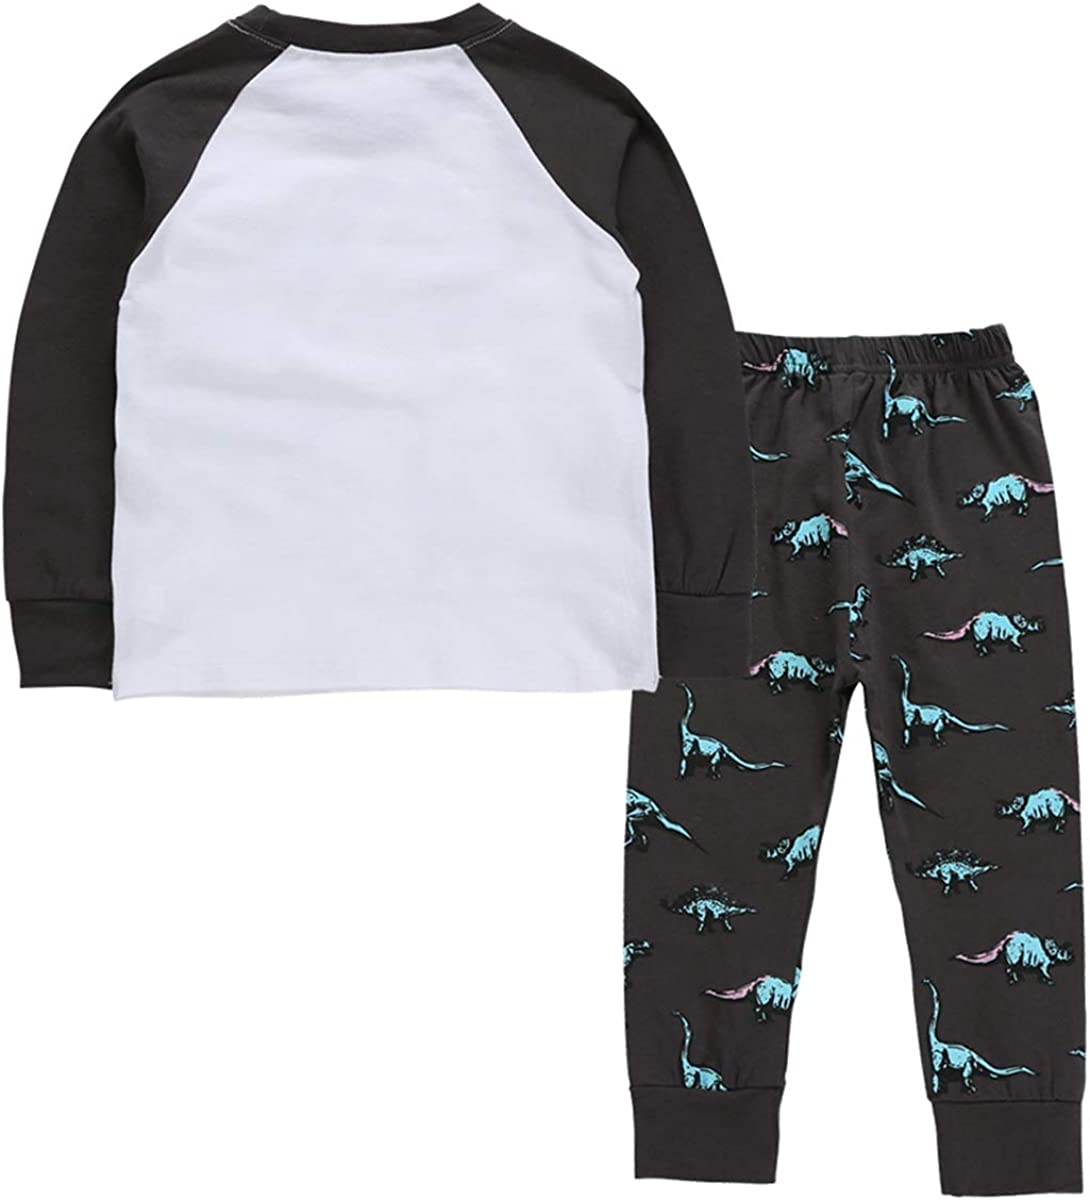 Ni/ños Primavera Oto/ño Pijamas con Estampado de Dinosaurio de Manga Larga Juego Leisure Home Wear 2pcs